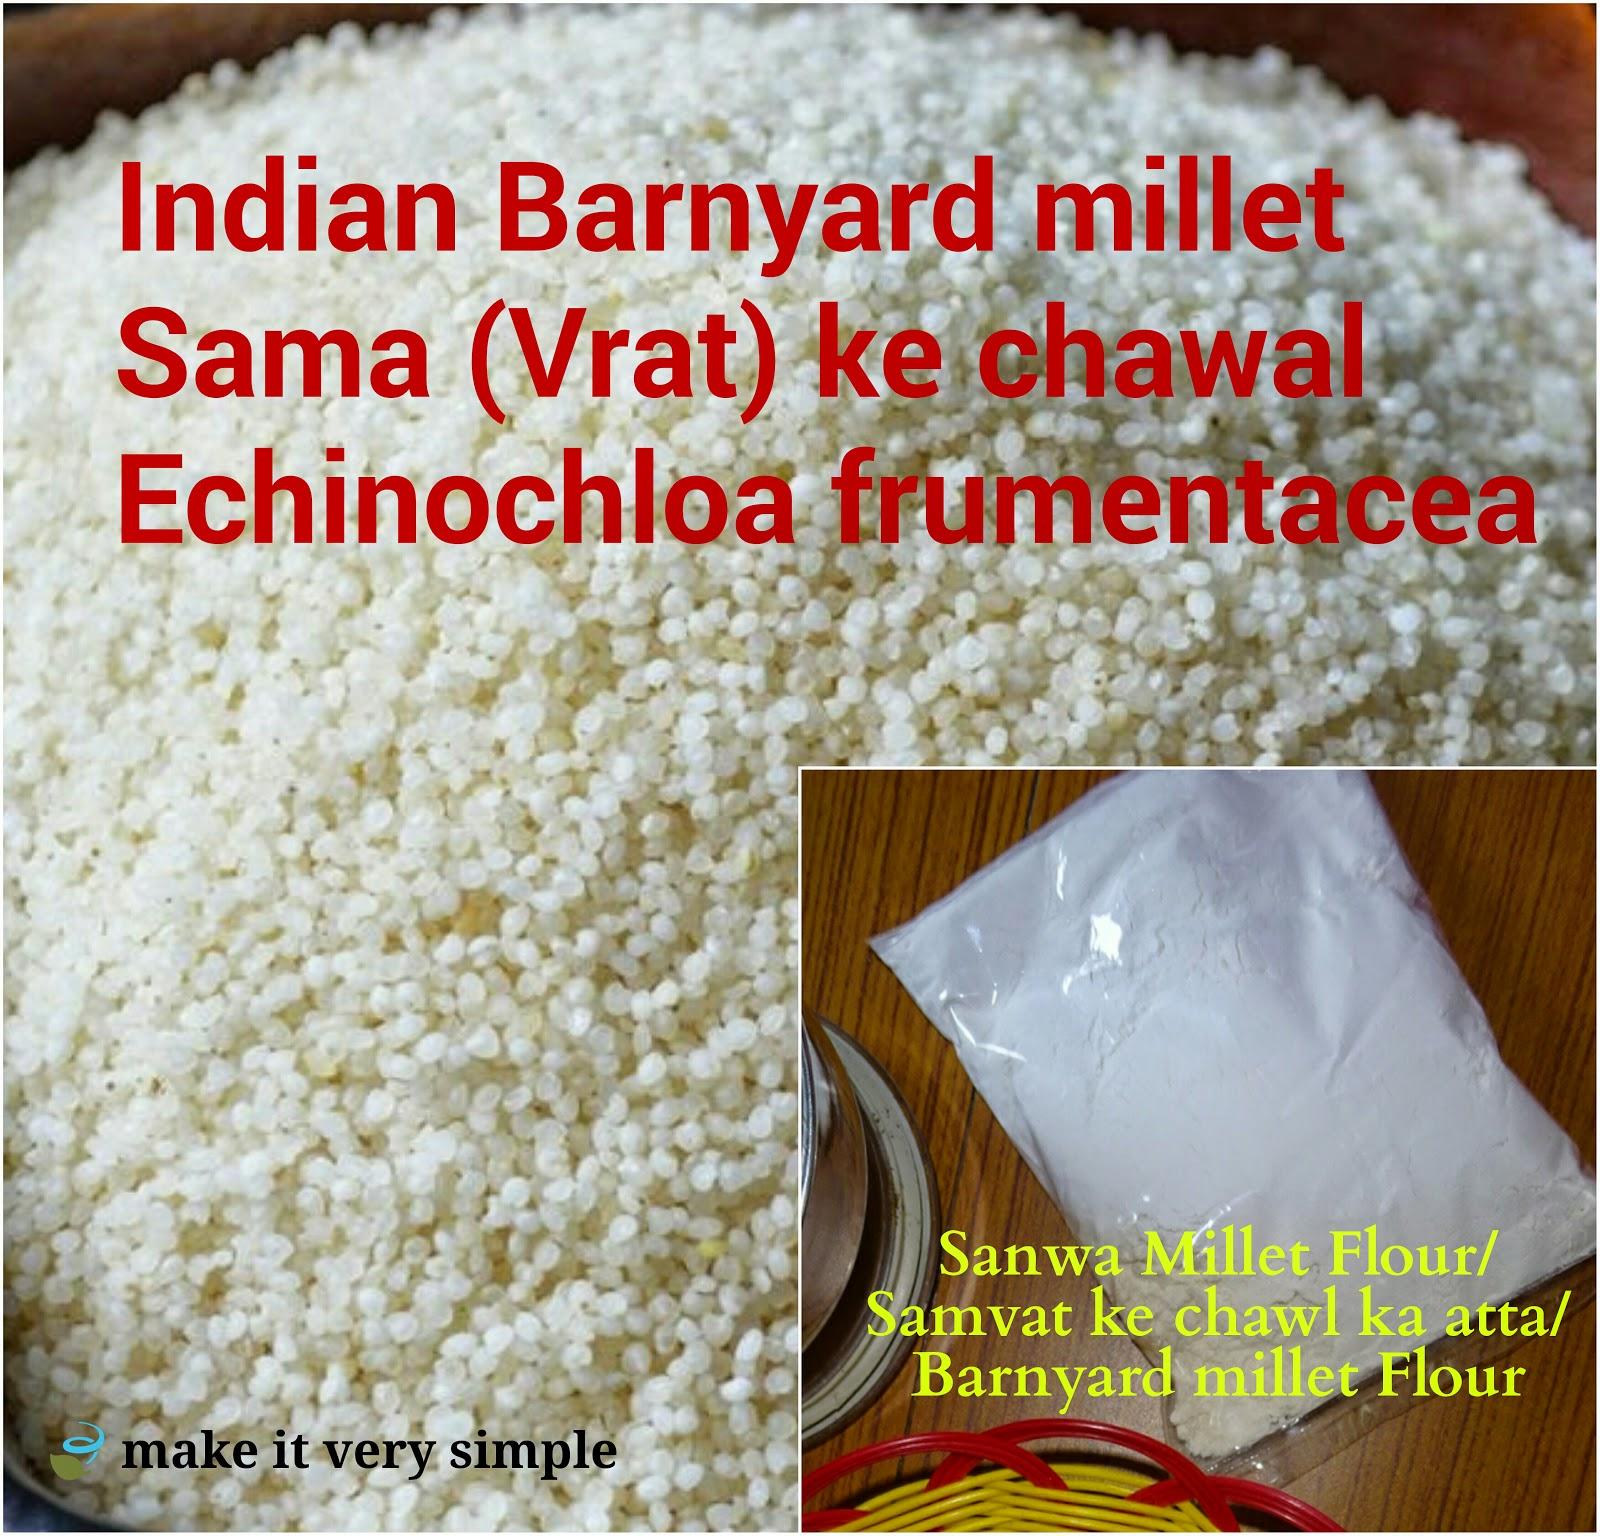 Veg Indian Good Food Recipes Ekadashi Fasting Food Sanwa Ke Attey Ka Aloo Paratha Sama